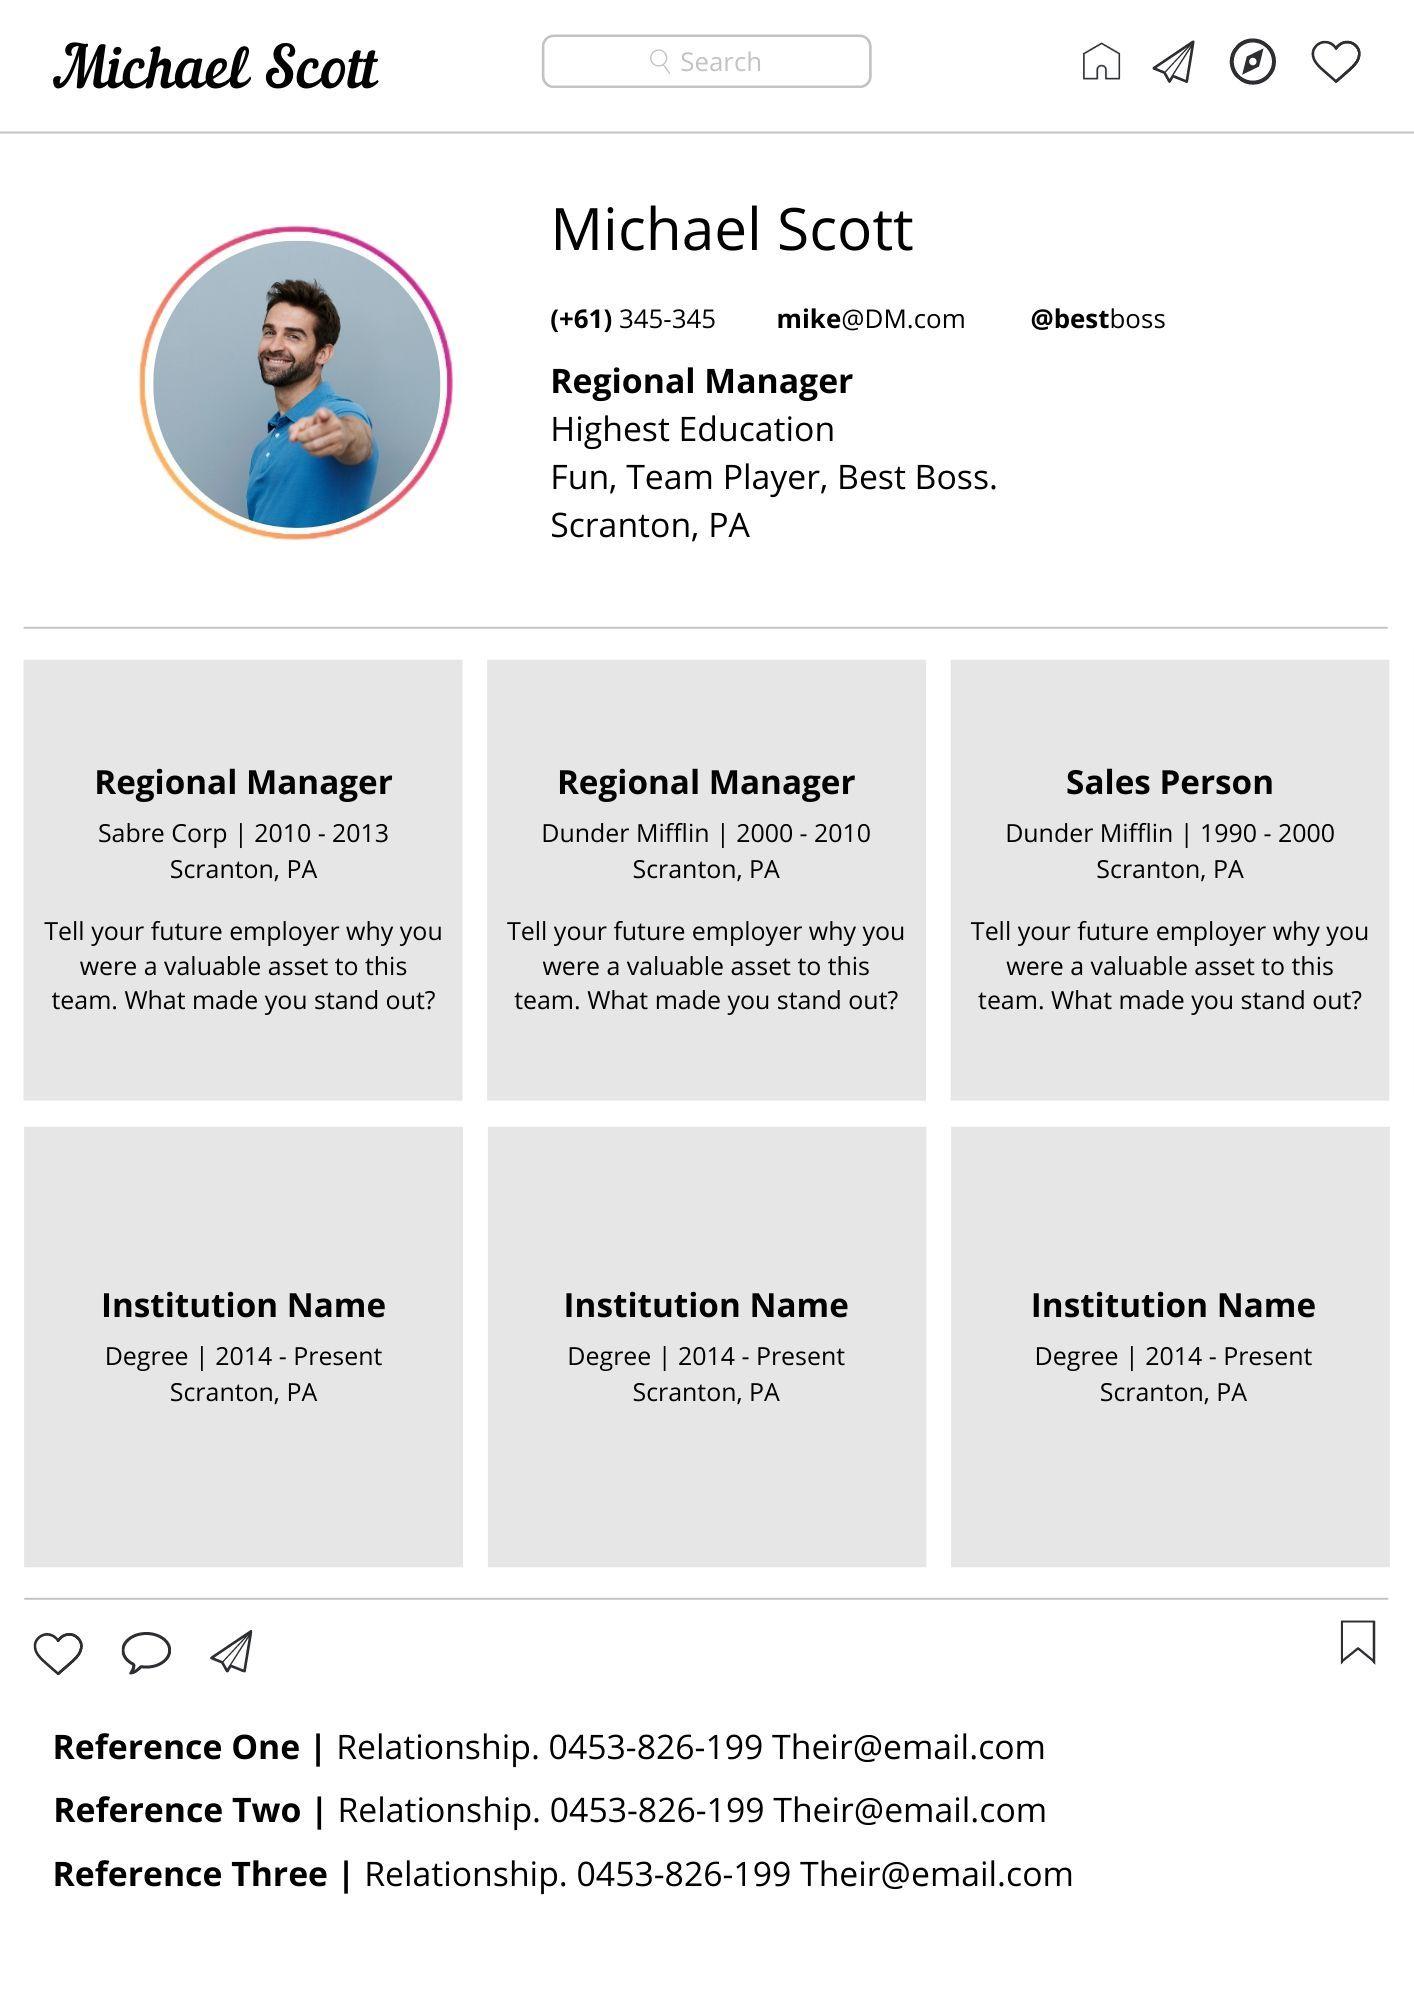 Resume Template Social Media Style in 2020 Workbook